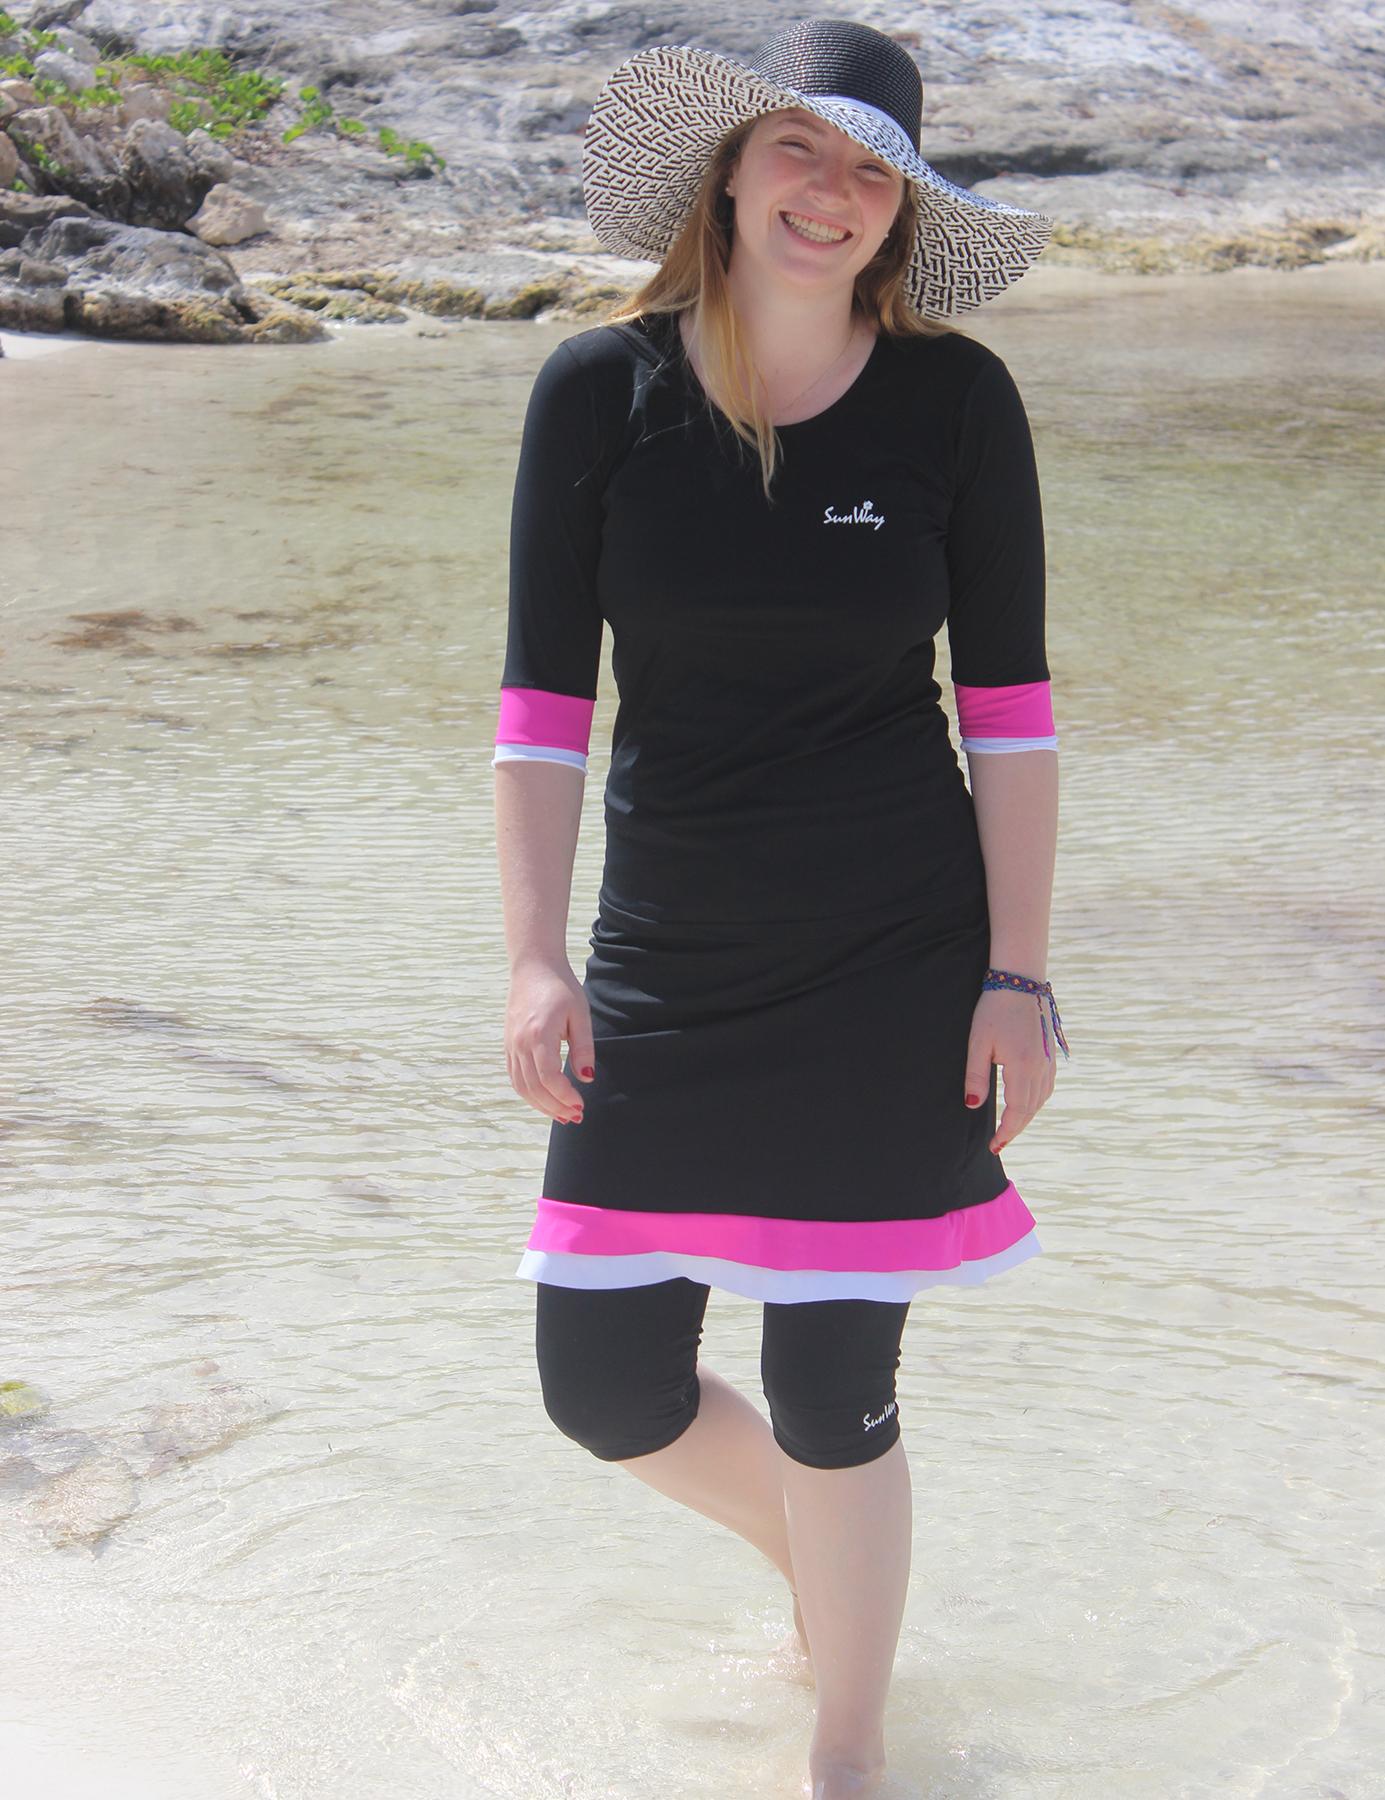 Modest Swimwear Outfit 4